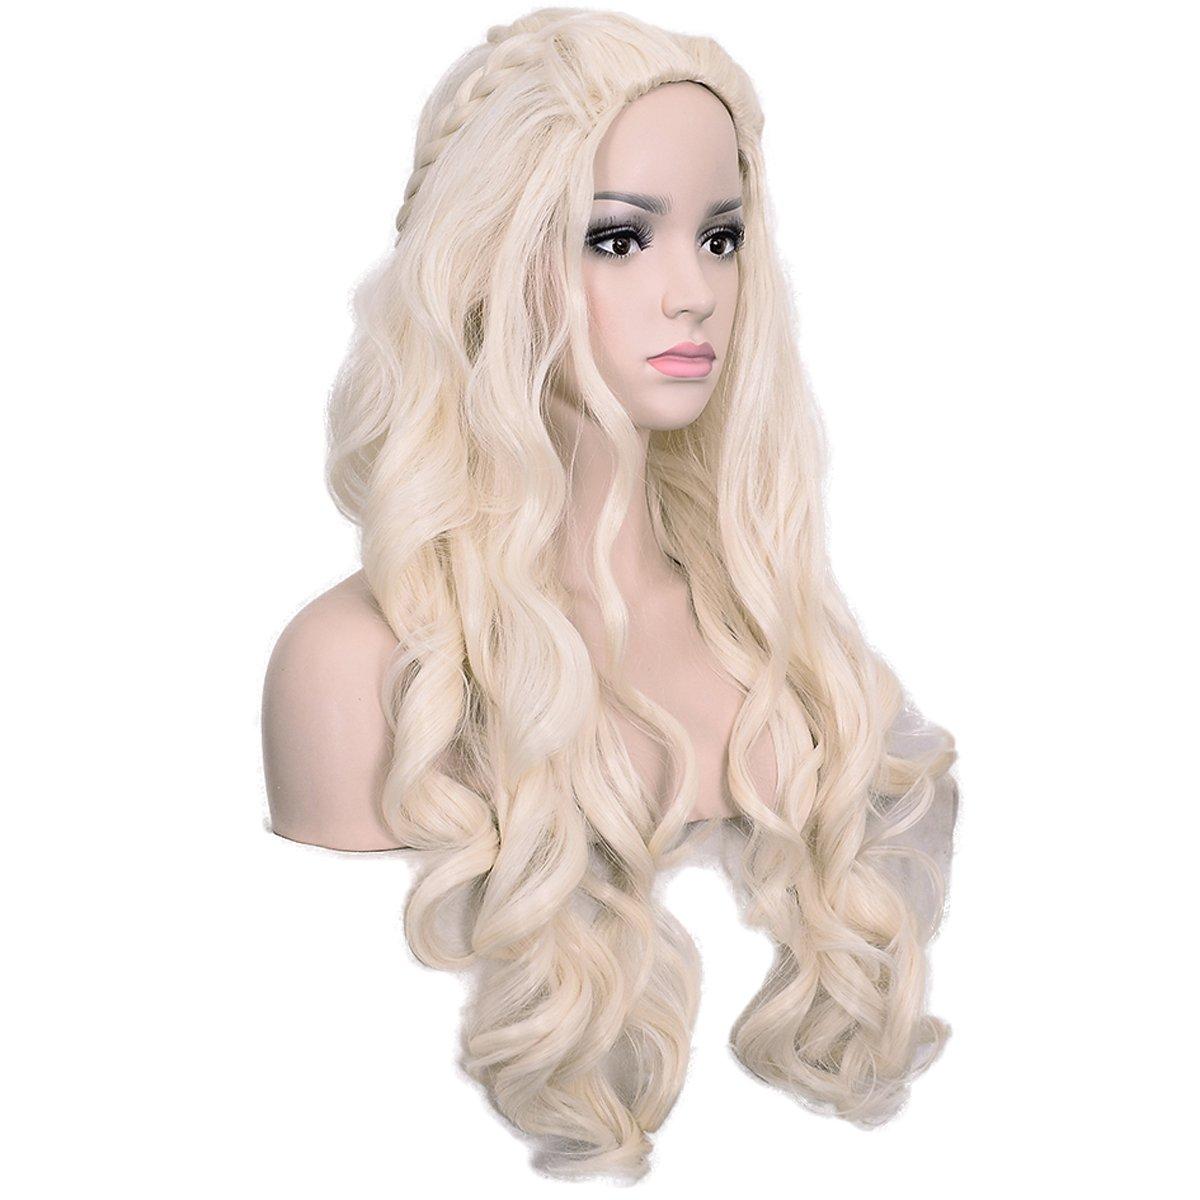 deifor largo rizado pelo sintético Wave con mechones de Daenerys Targaryen disfraz Cosplay Pelucas: Amazon.es: Belleza